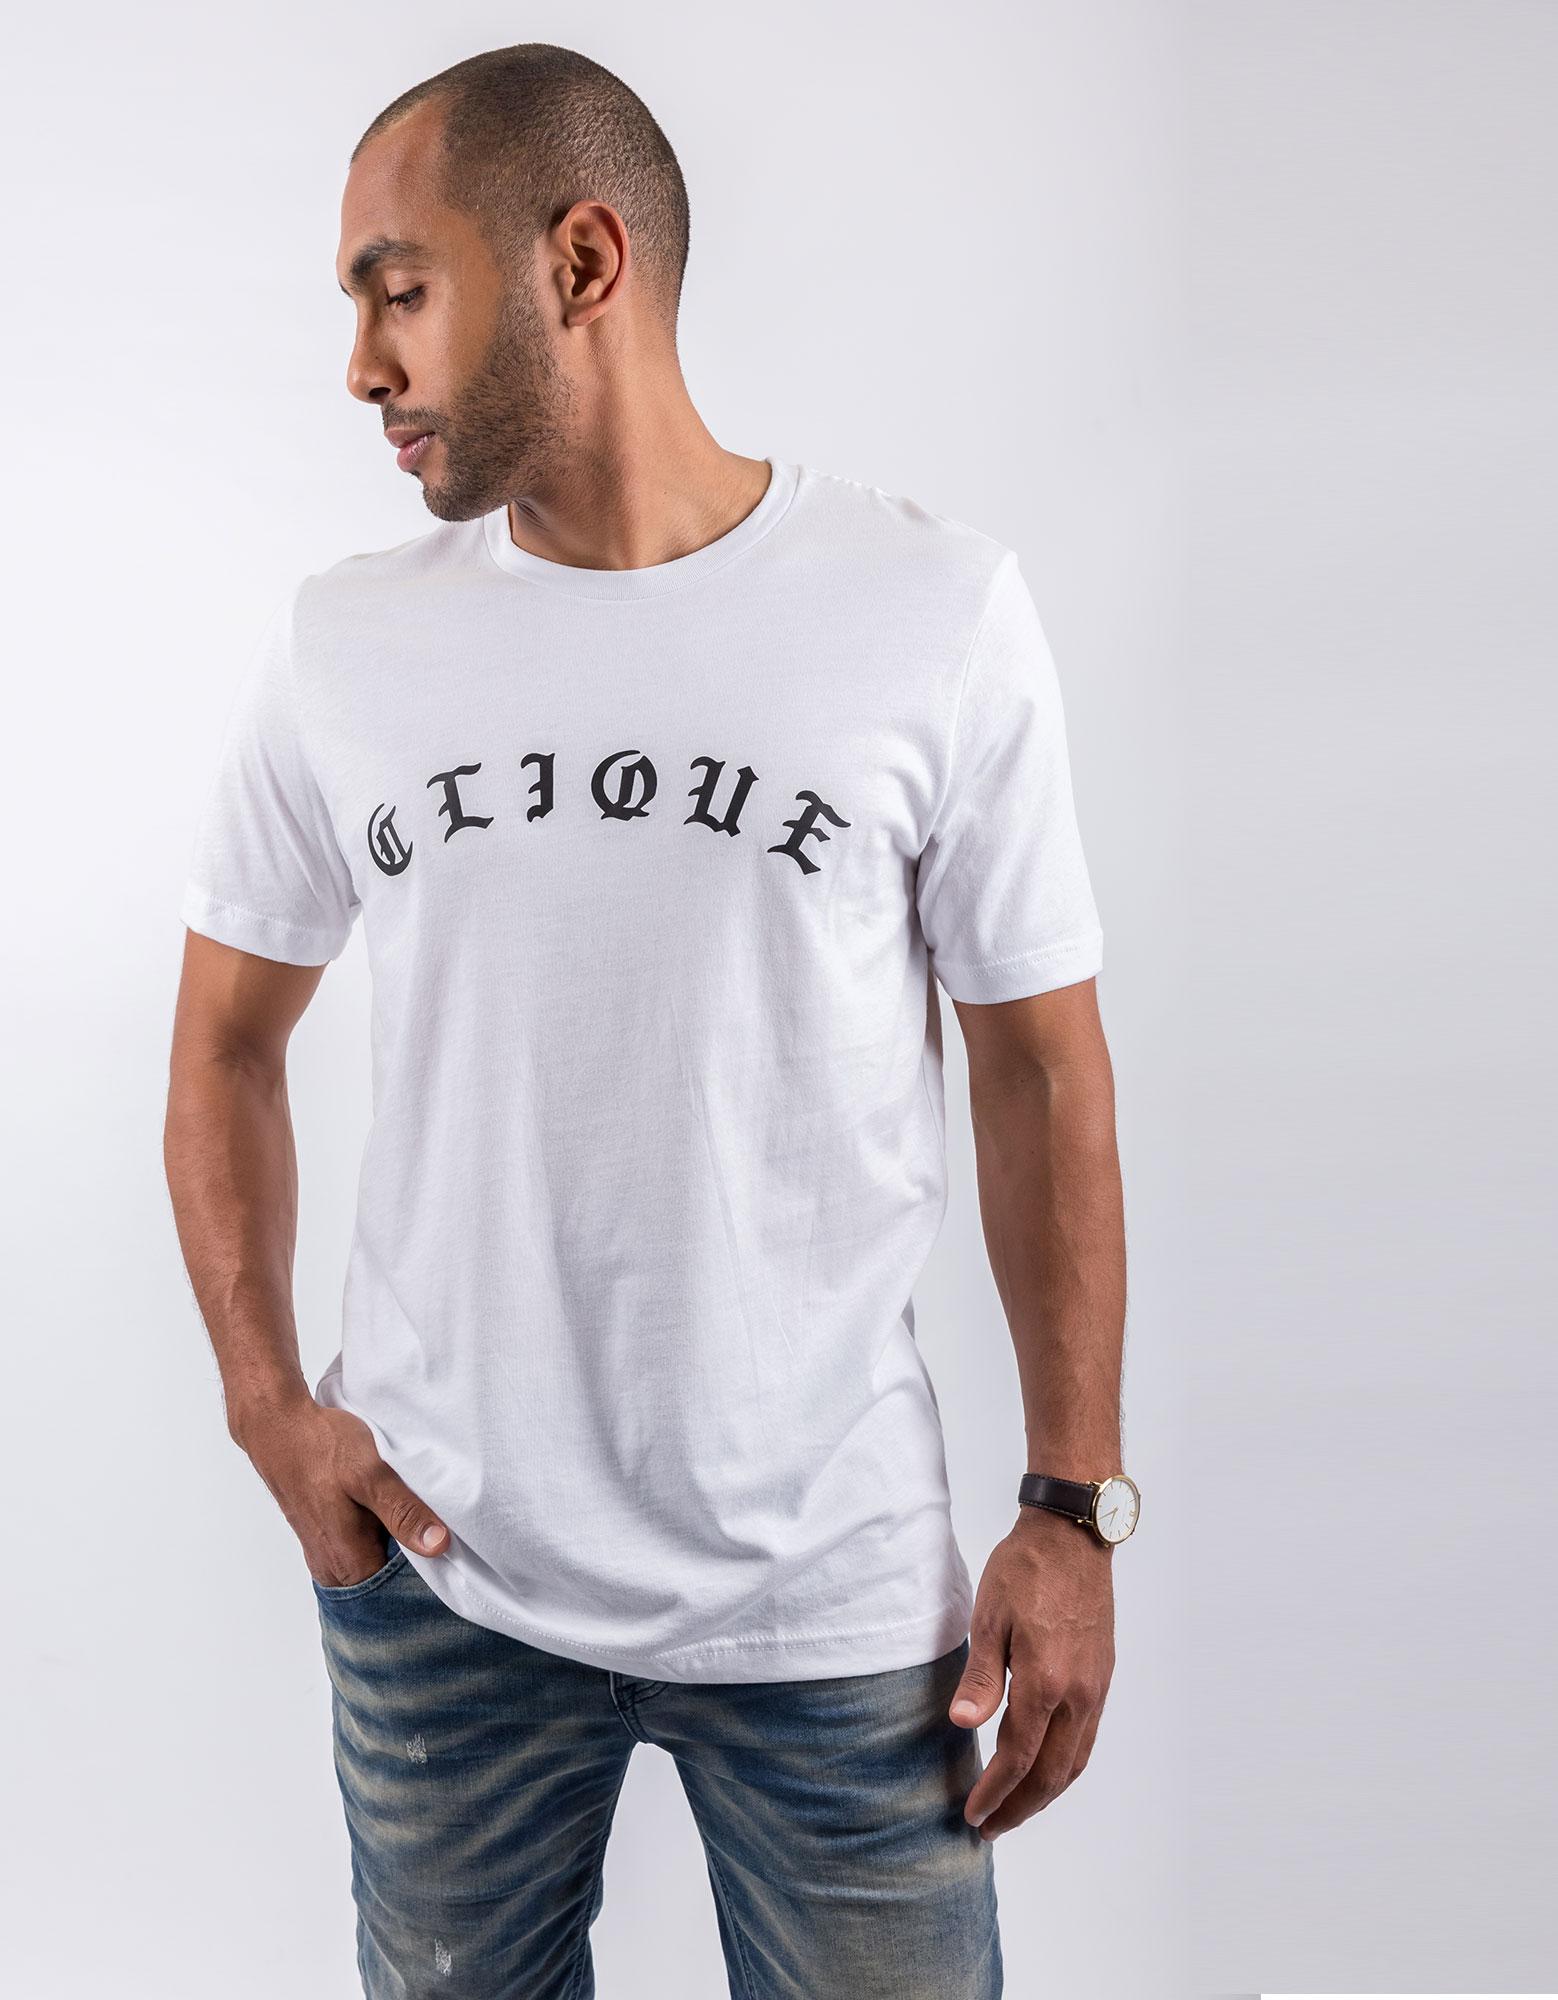 Save The People Clique White Unisex T-Shirt L